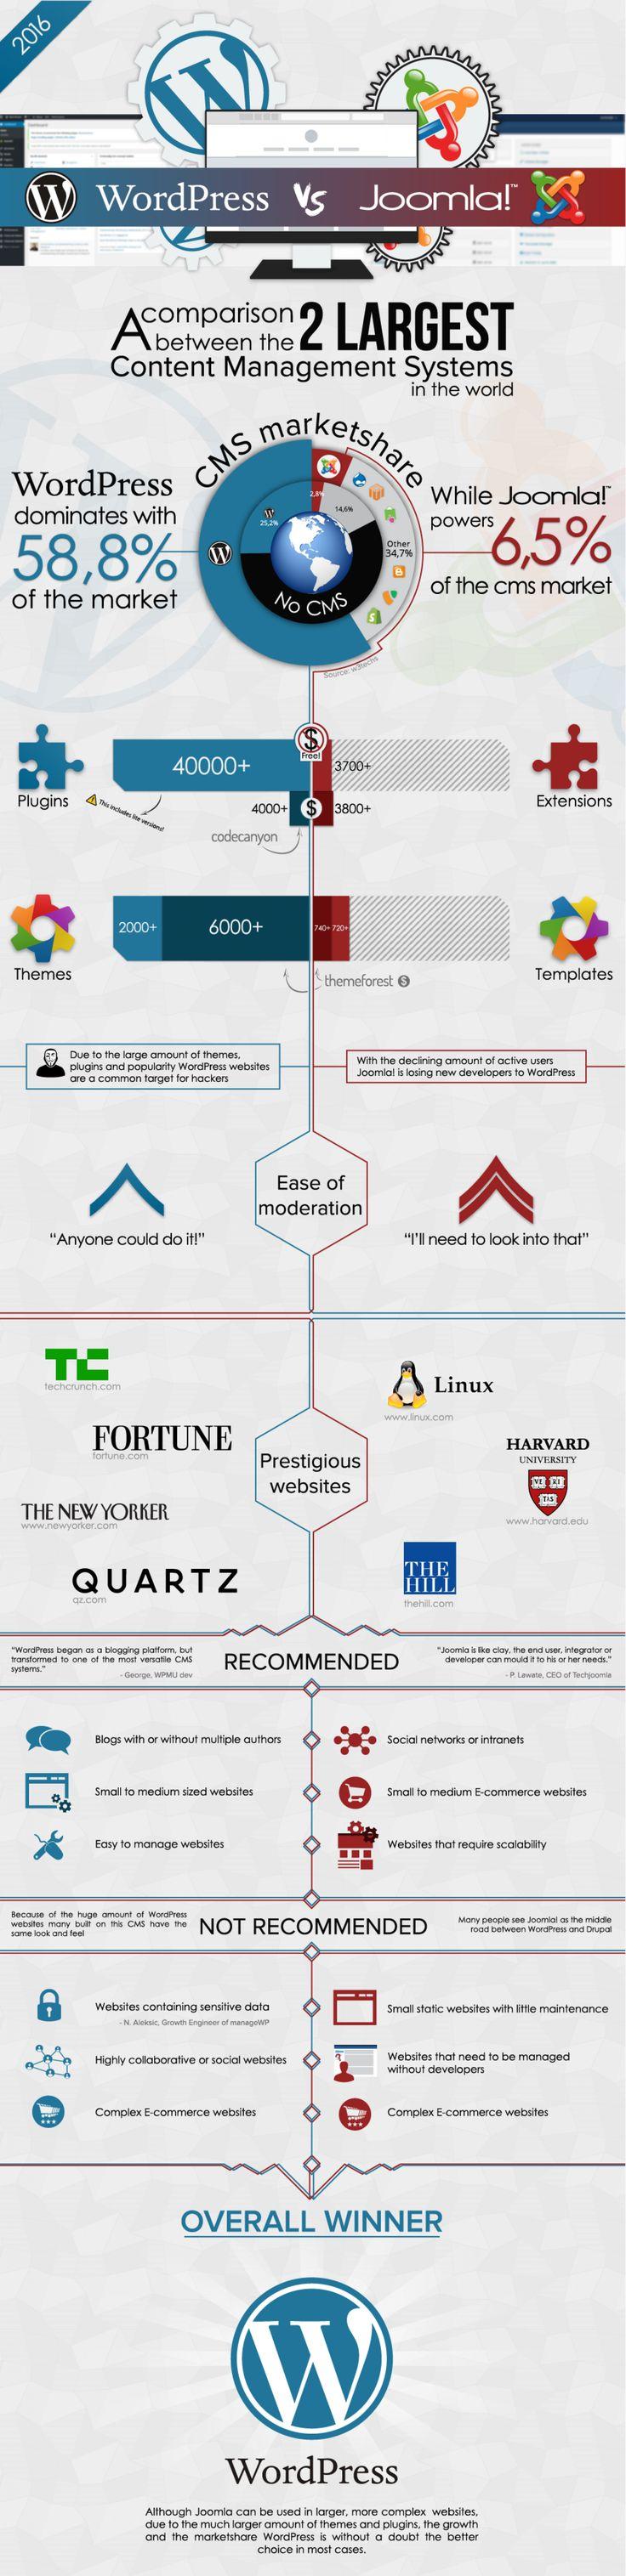 WordPress VS Joomla Infographic